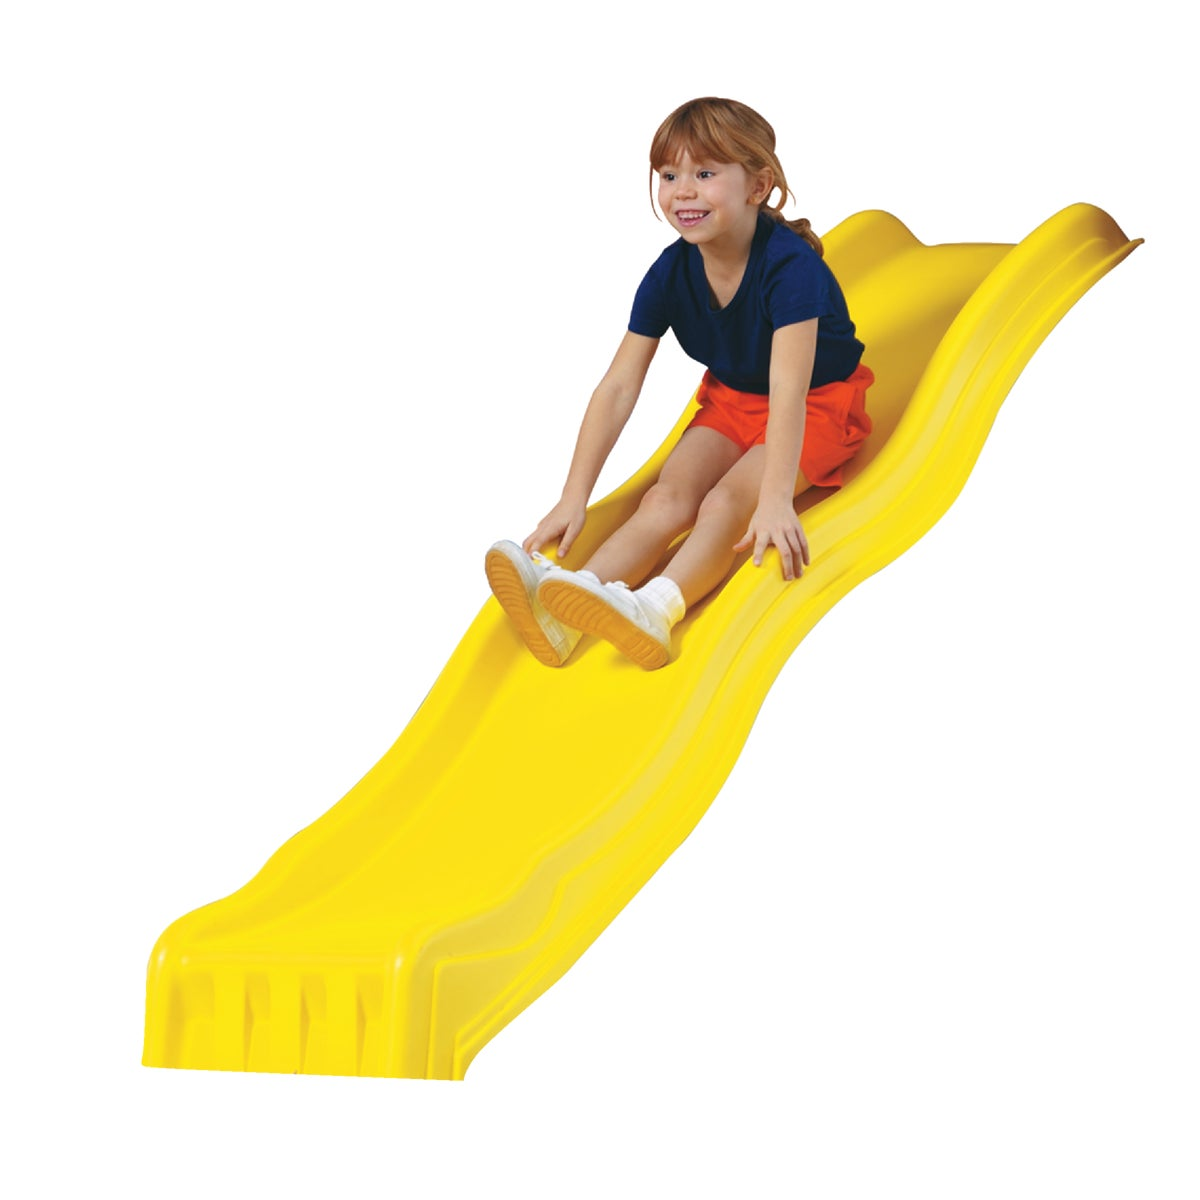 Swing N Slide YELLOW COOL WAVE SLIDE NE4675-12